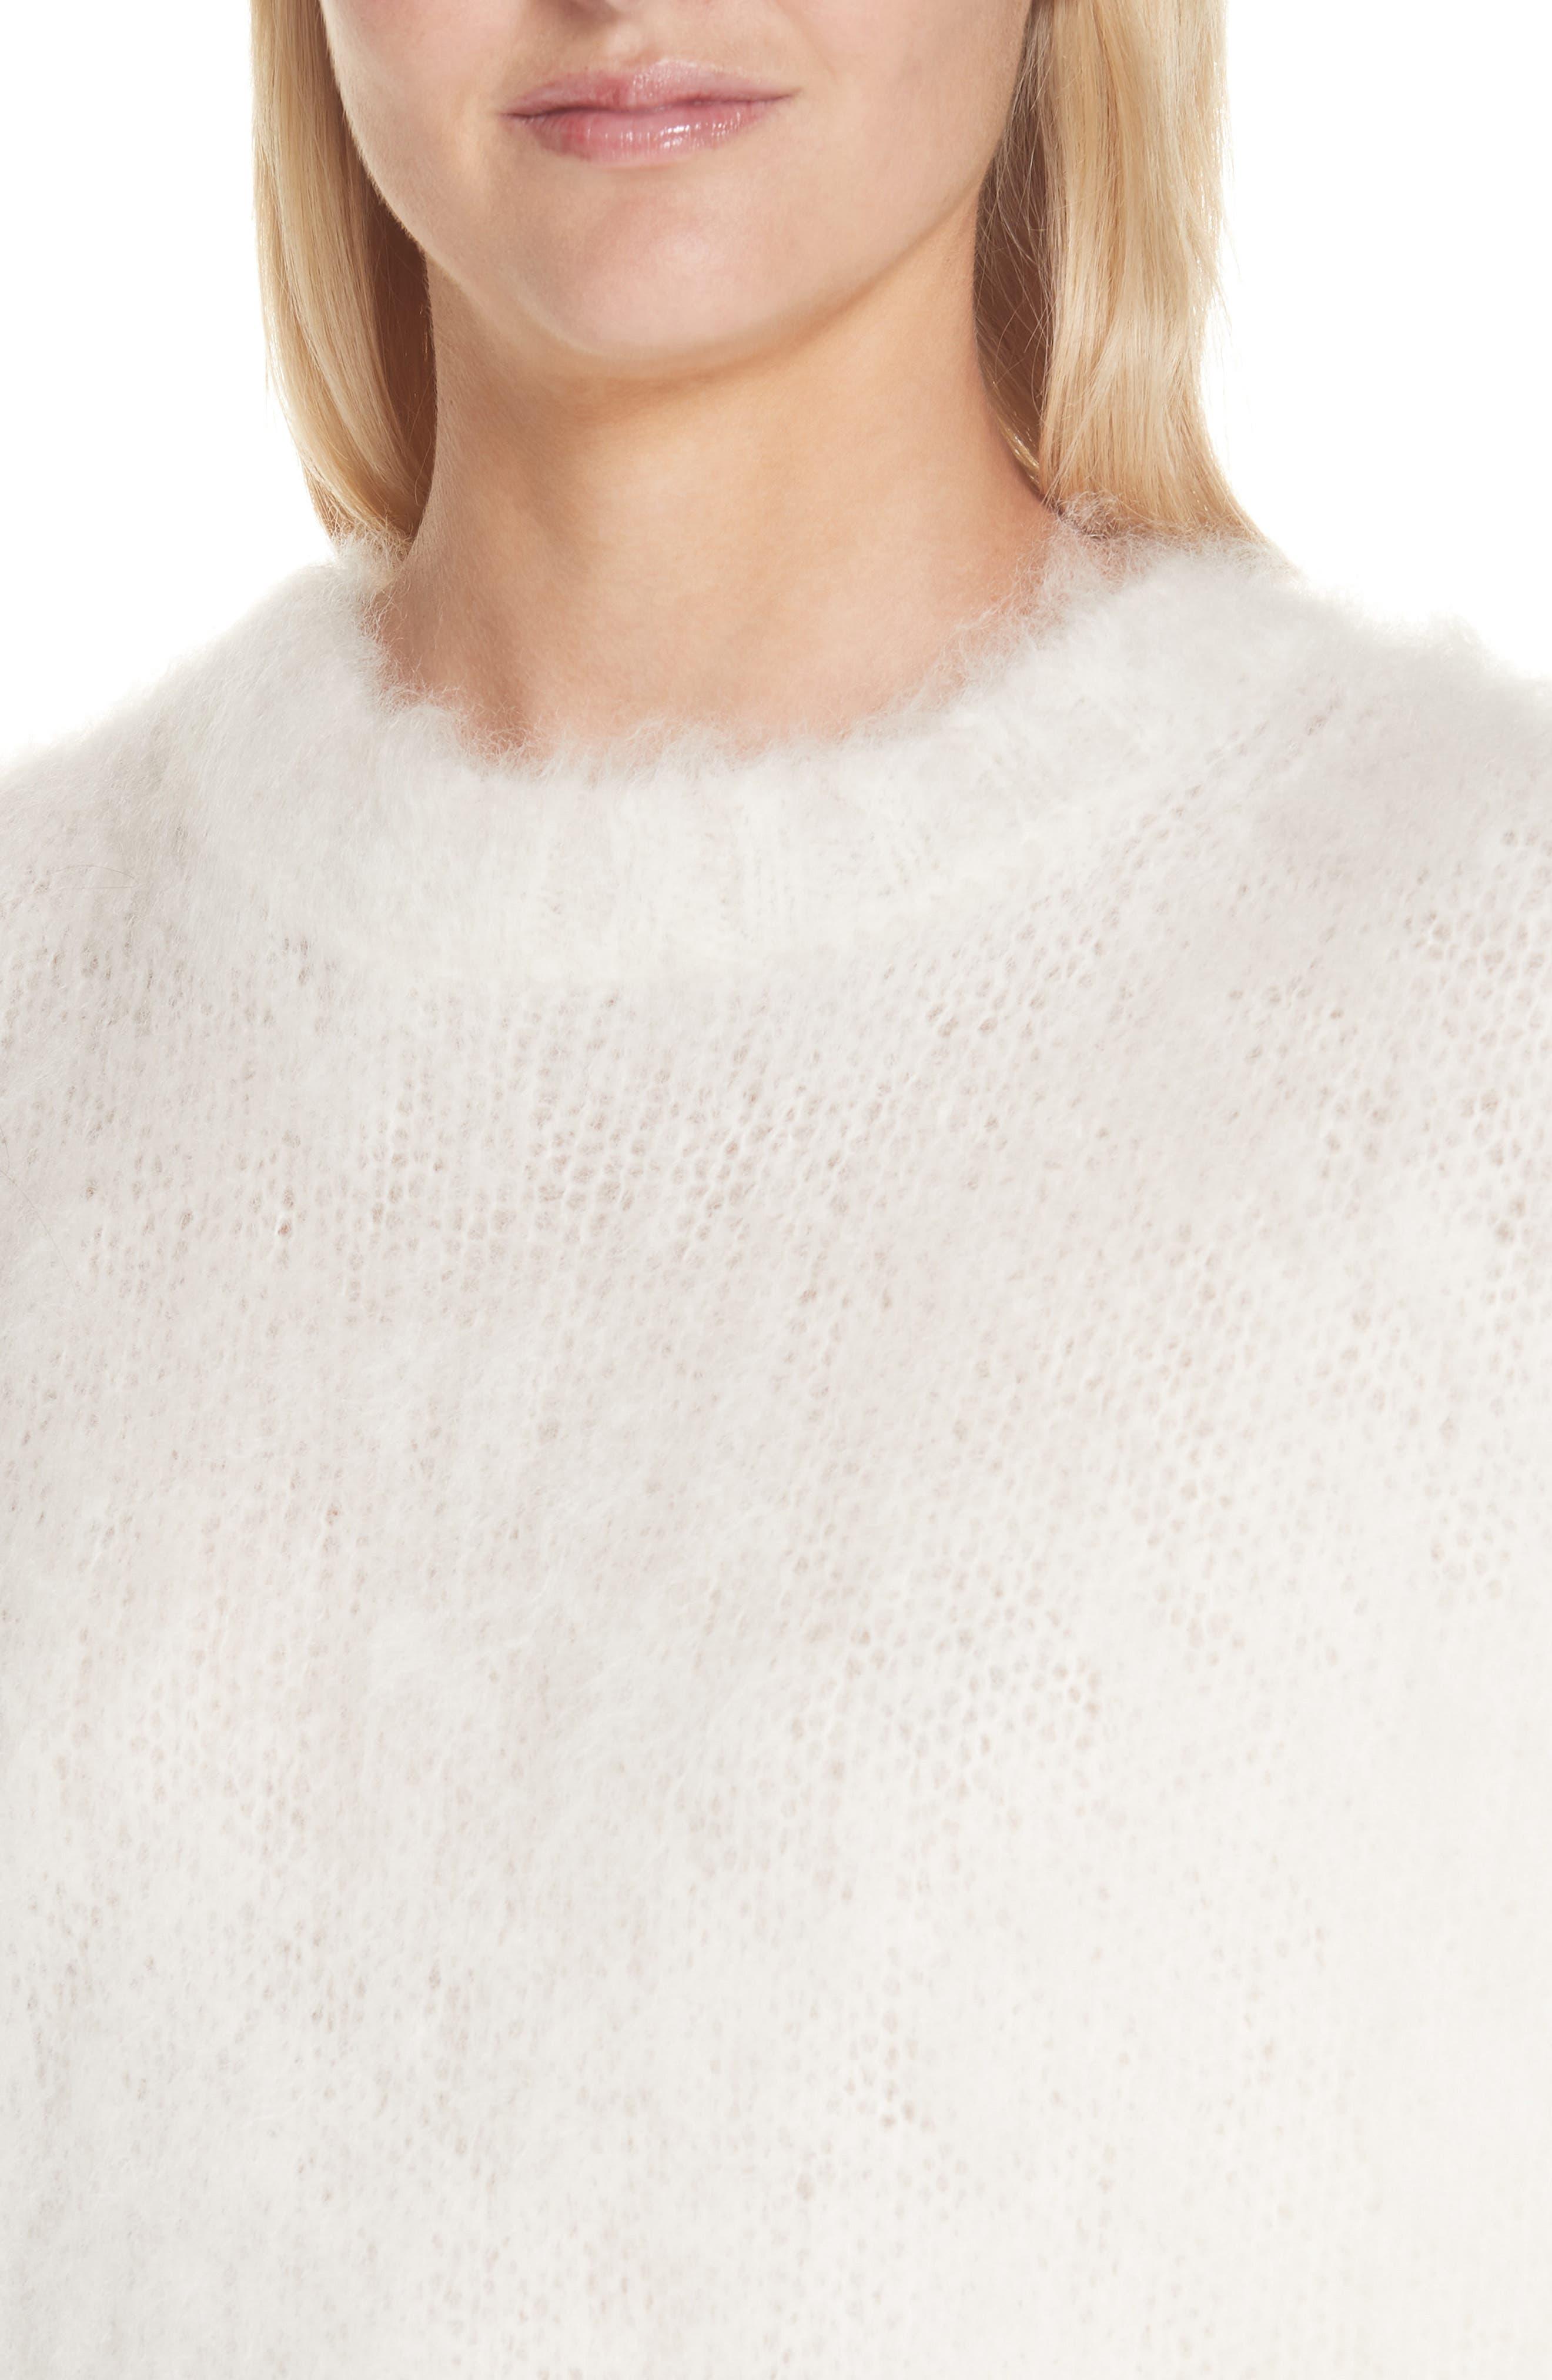 HELMUT LANG, Mohair Blend Sweater, Alternate thumbnail 4, color, NATURAL WHITE